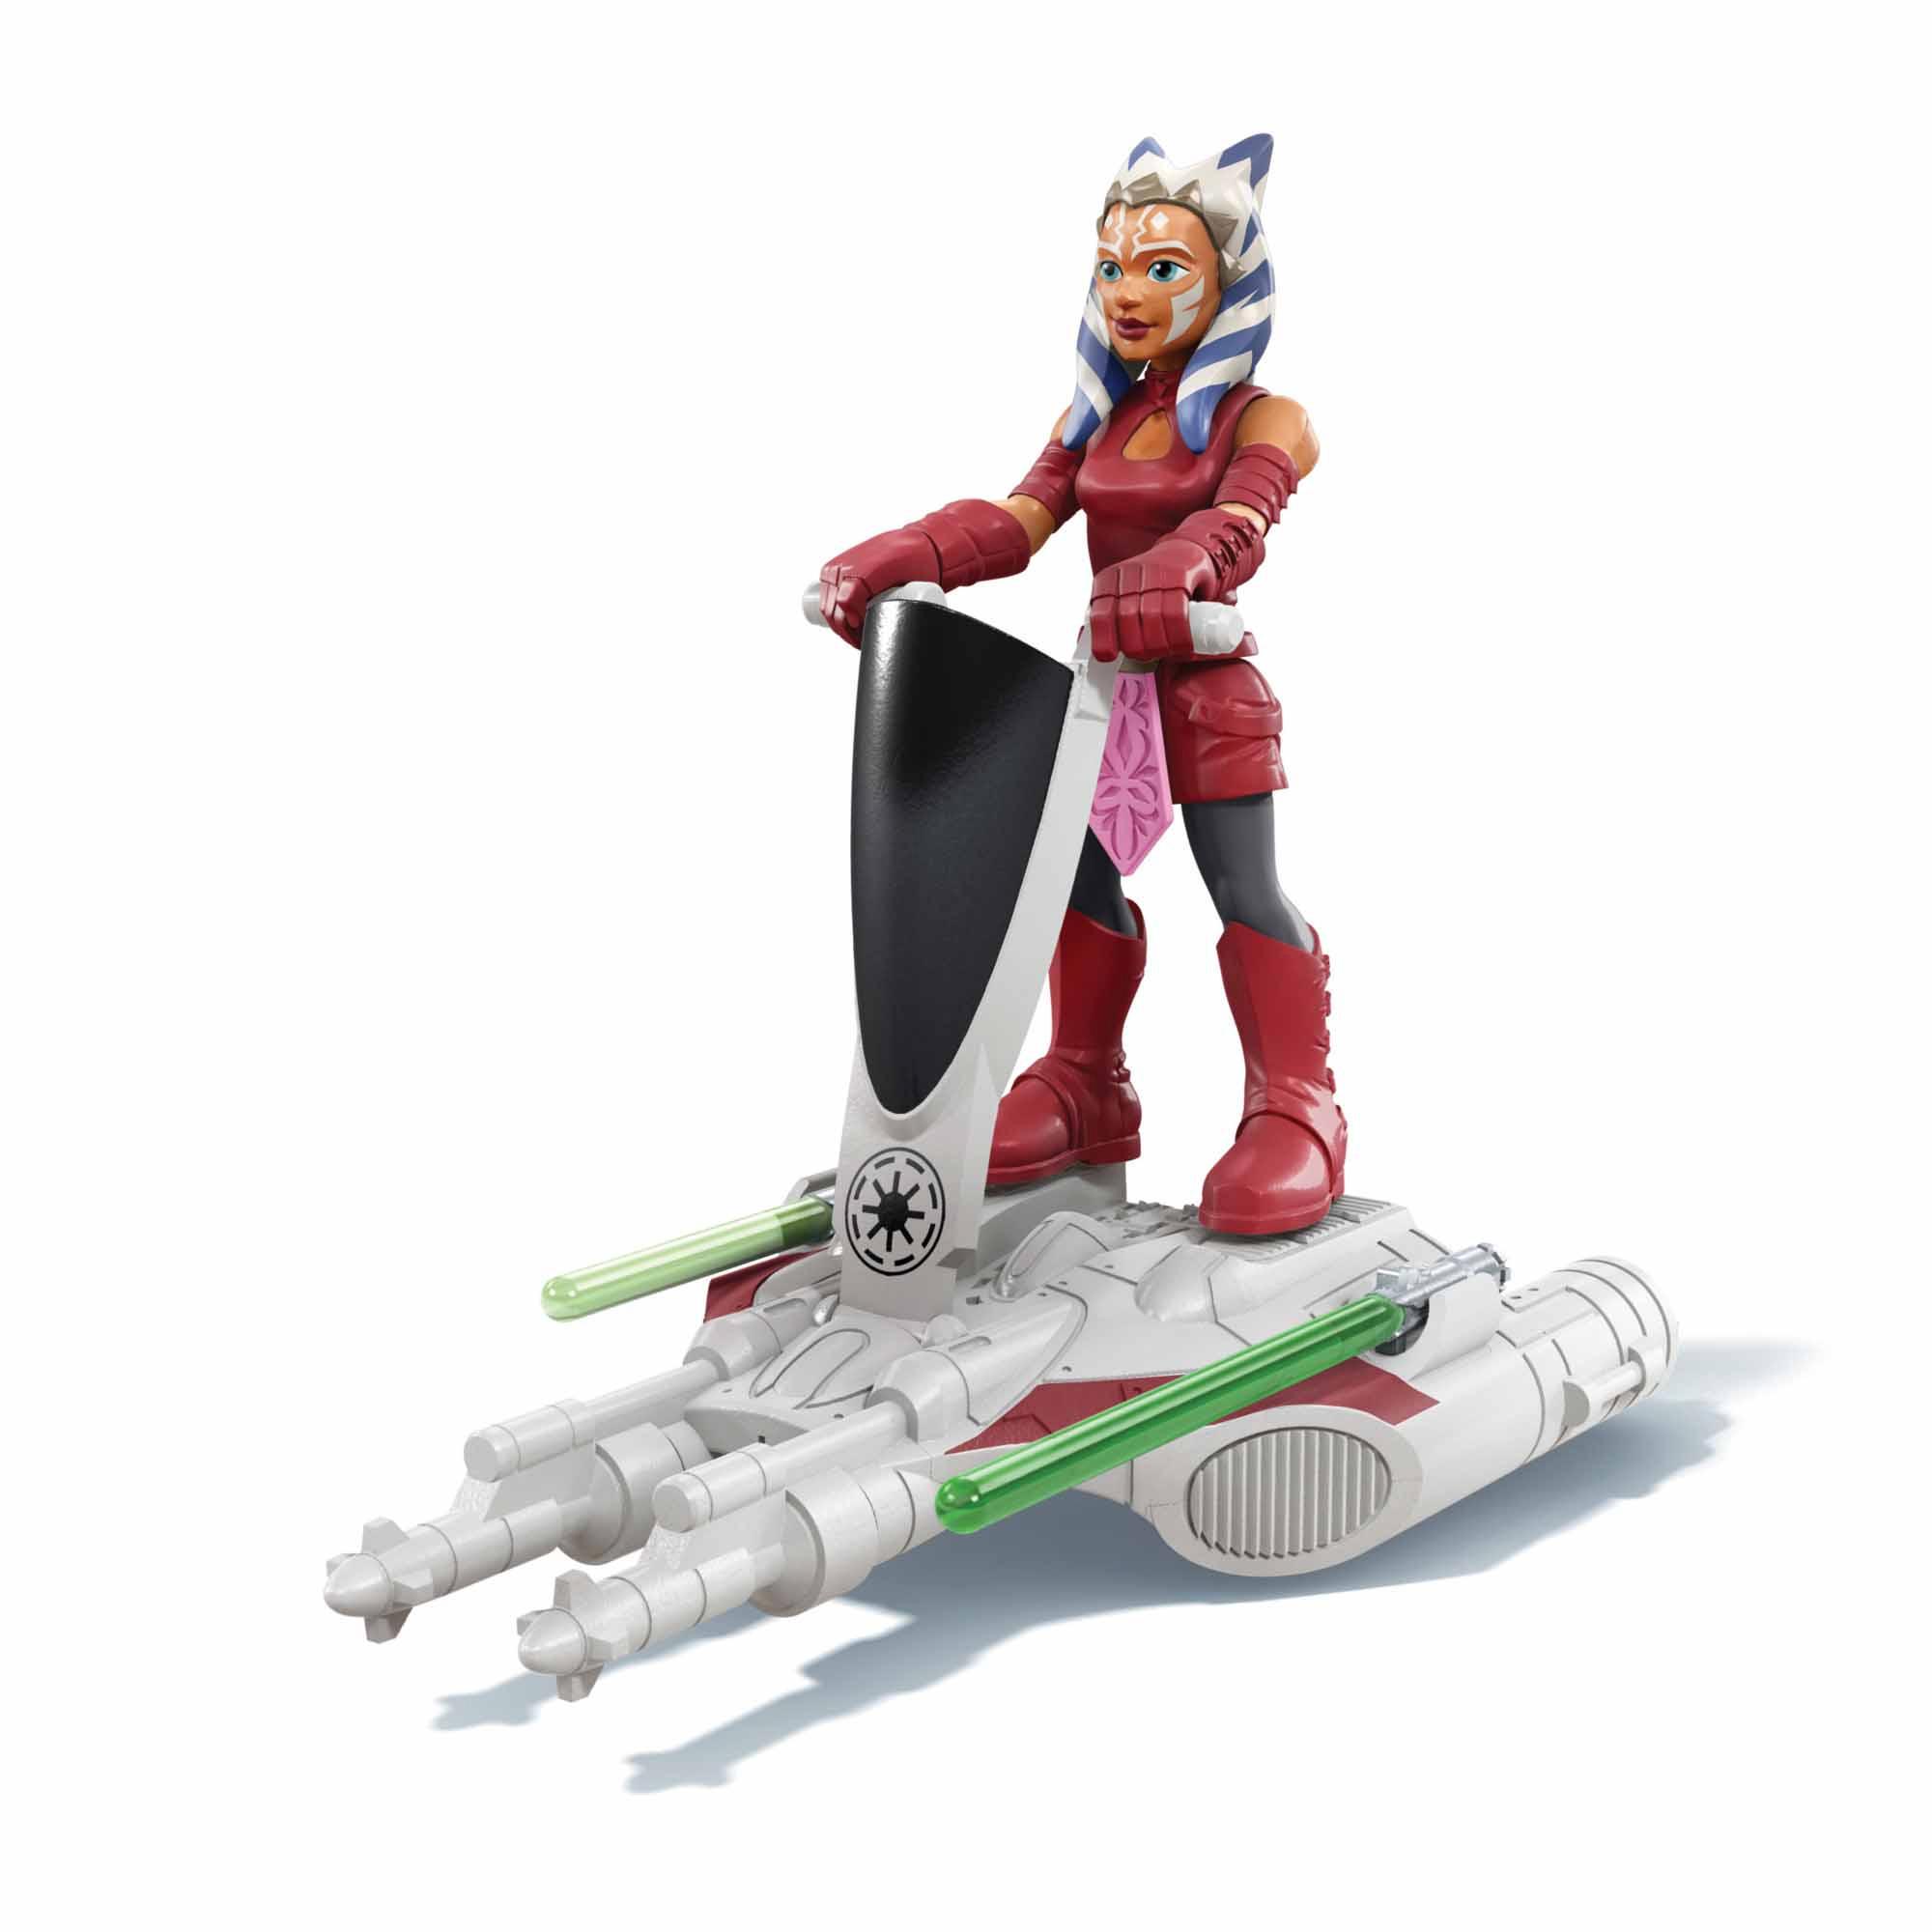 Star Wars Mission Fleet Ahsoka Tano Aquatic Attack